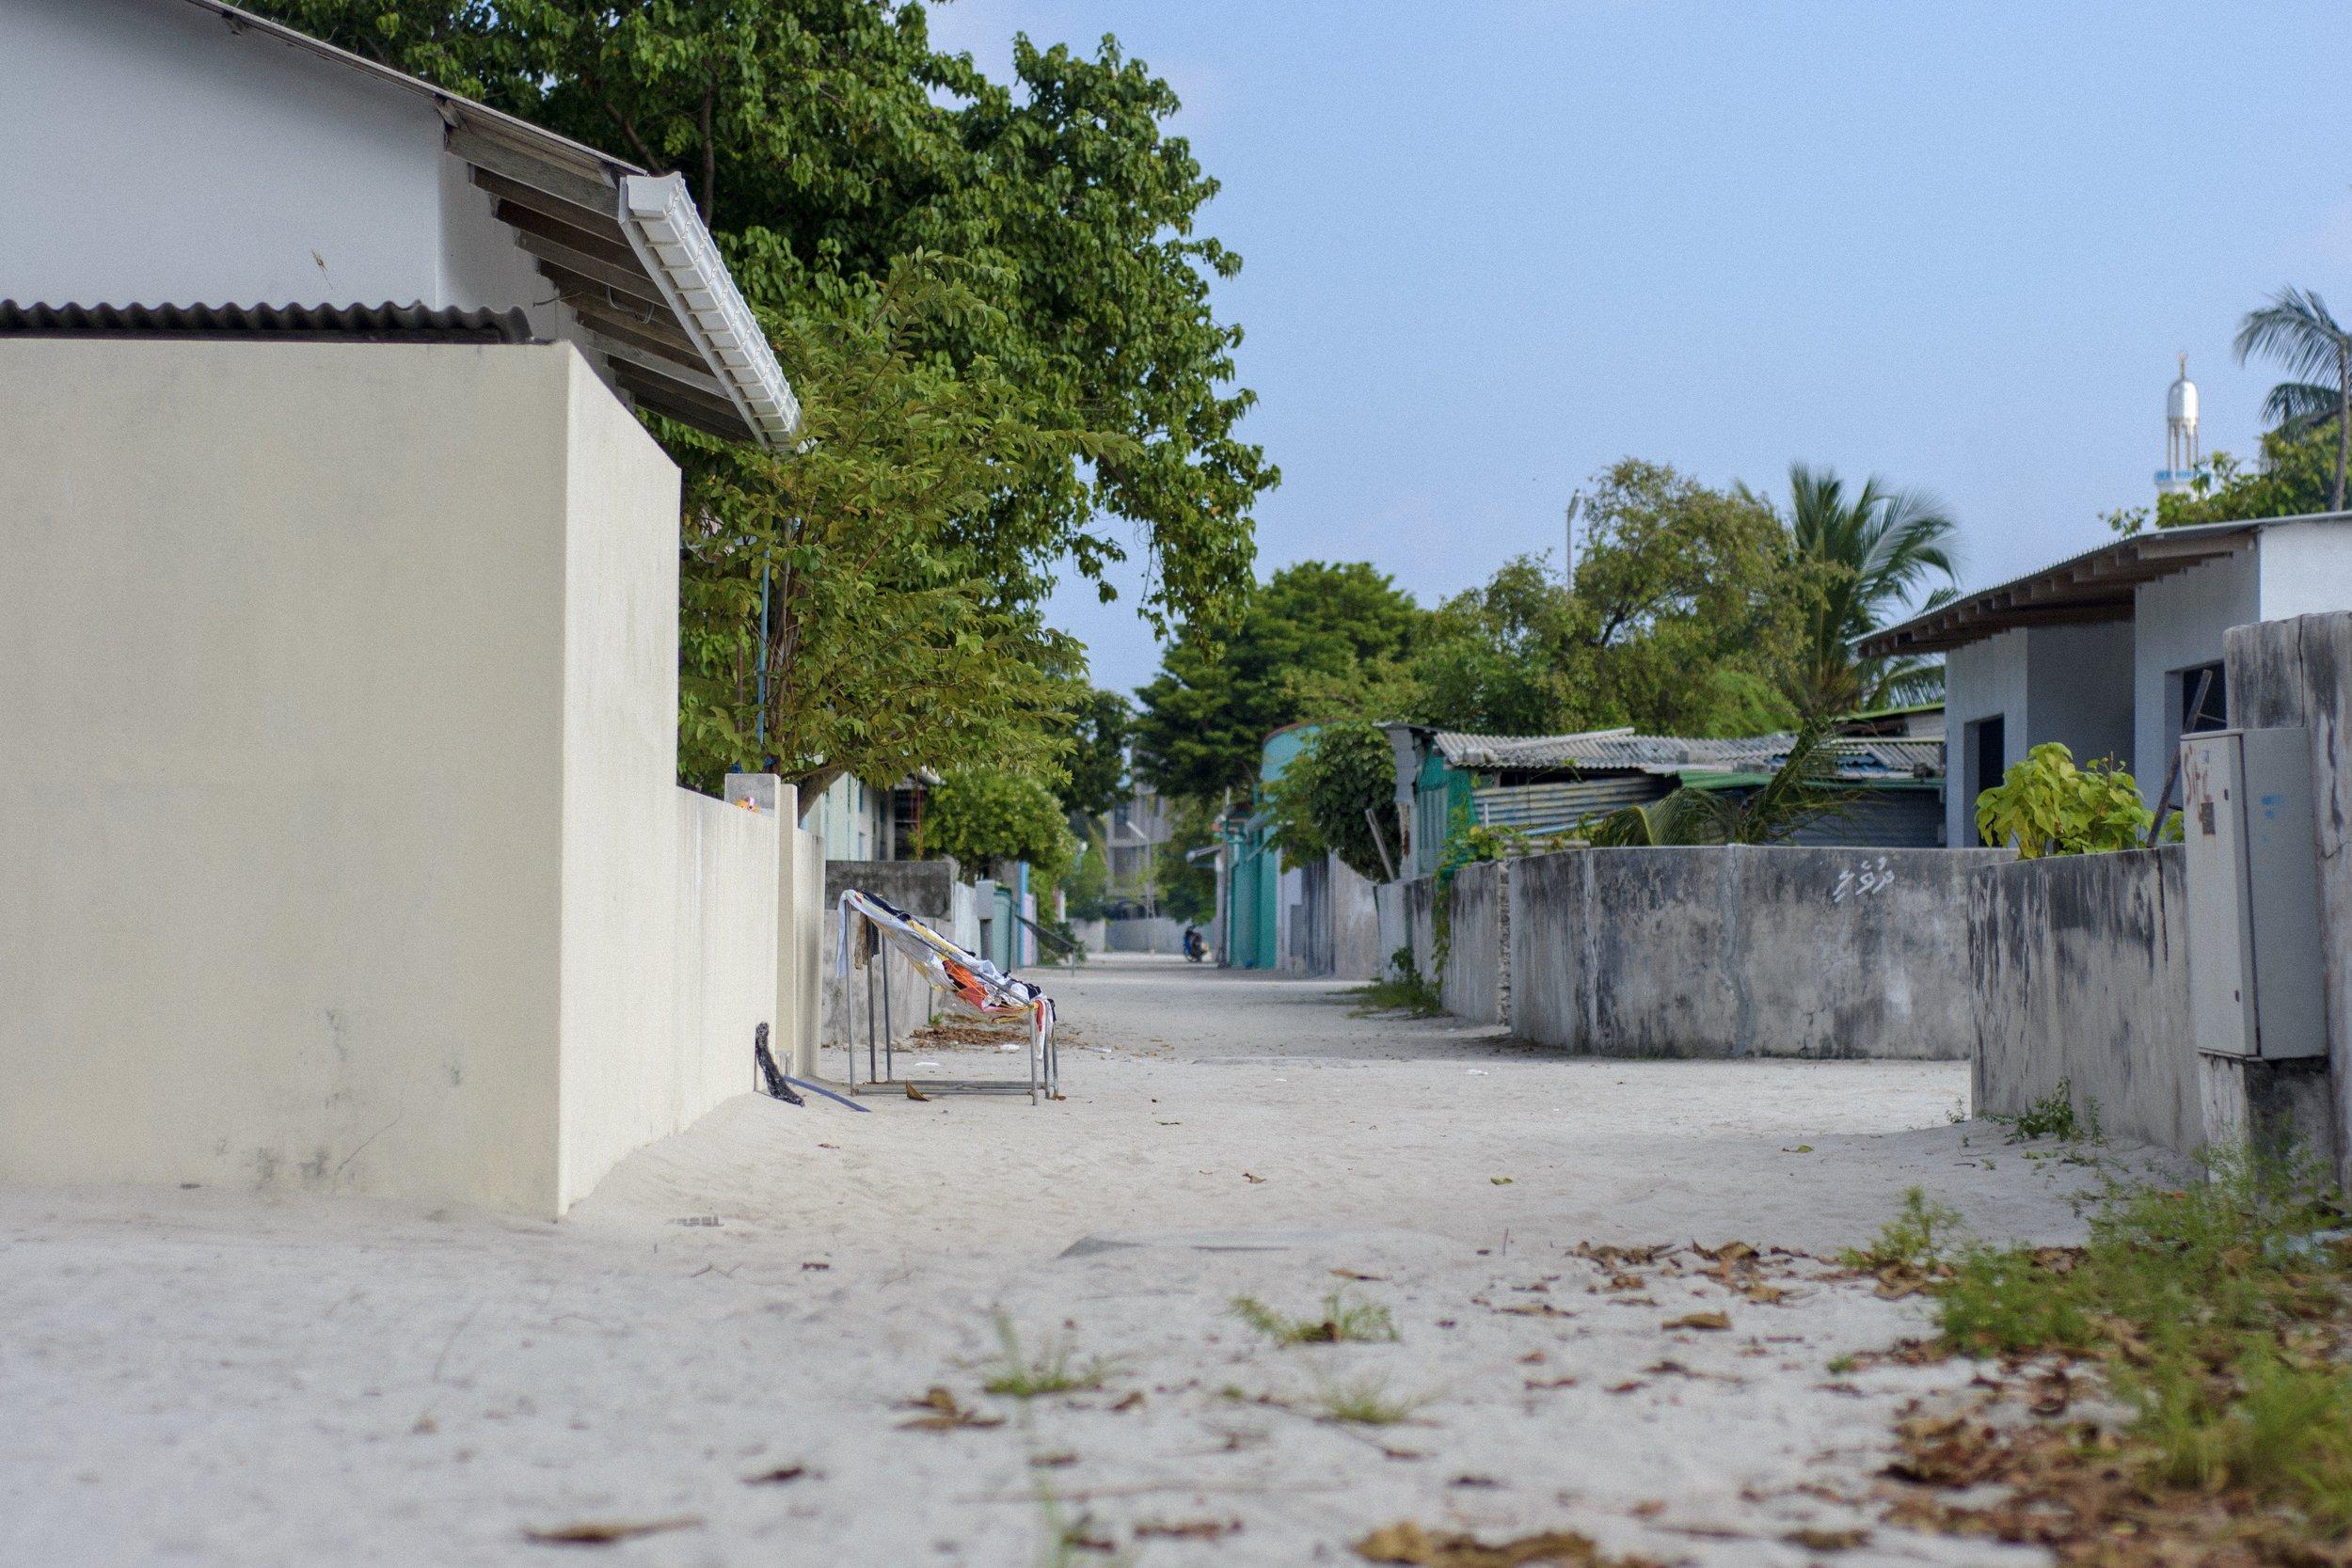 Nikon D3100.  Eydhafushi, Maldives.   (2013)